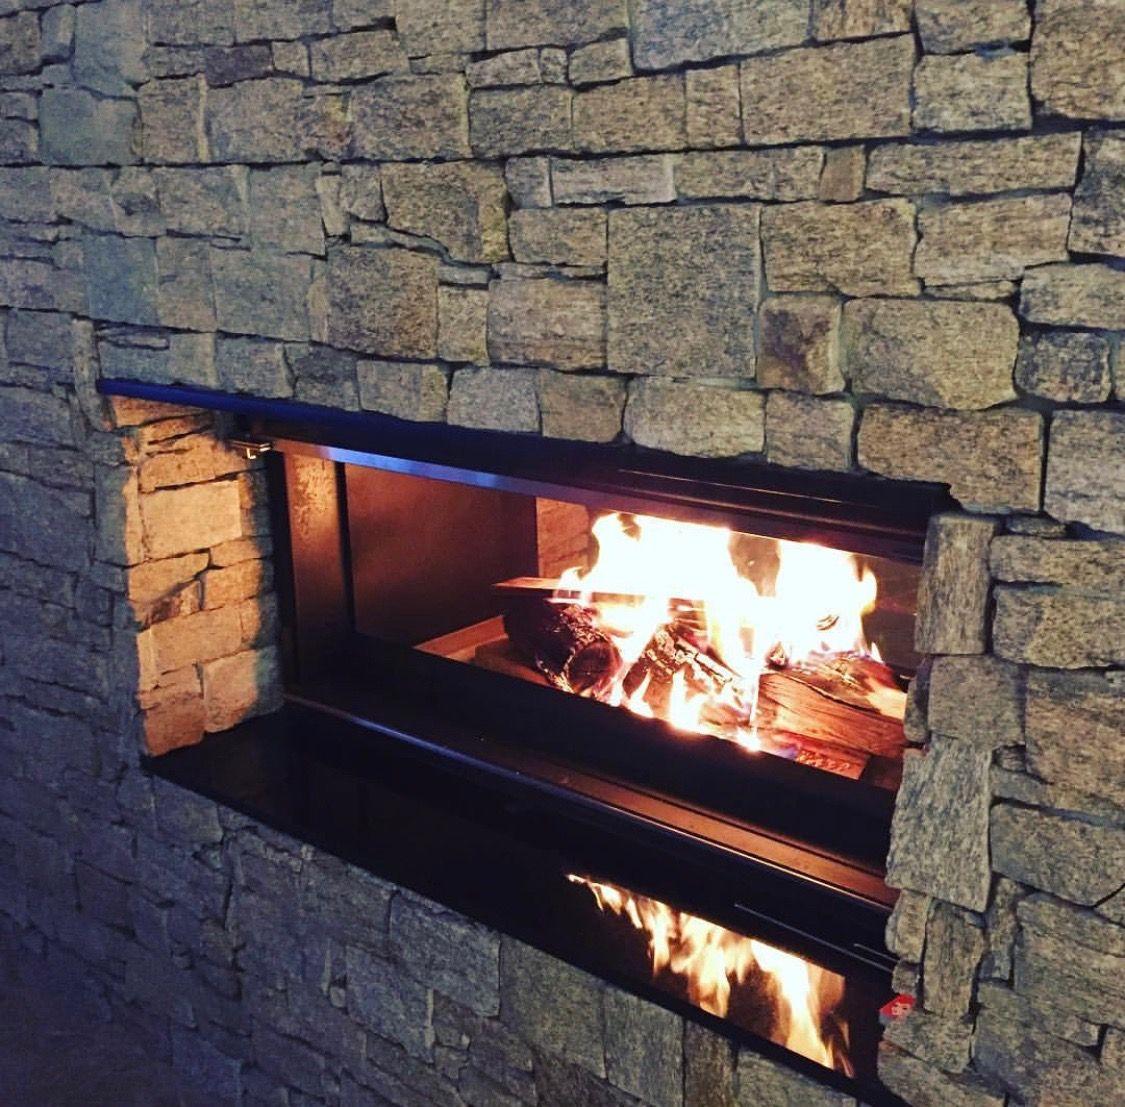 Radiant 1200 Bea Cheminees Philippe Fireplaces Australia The